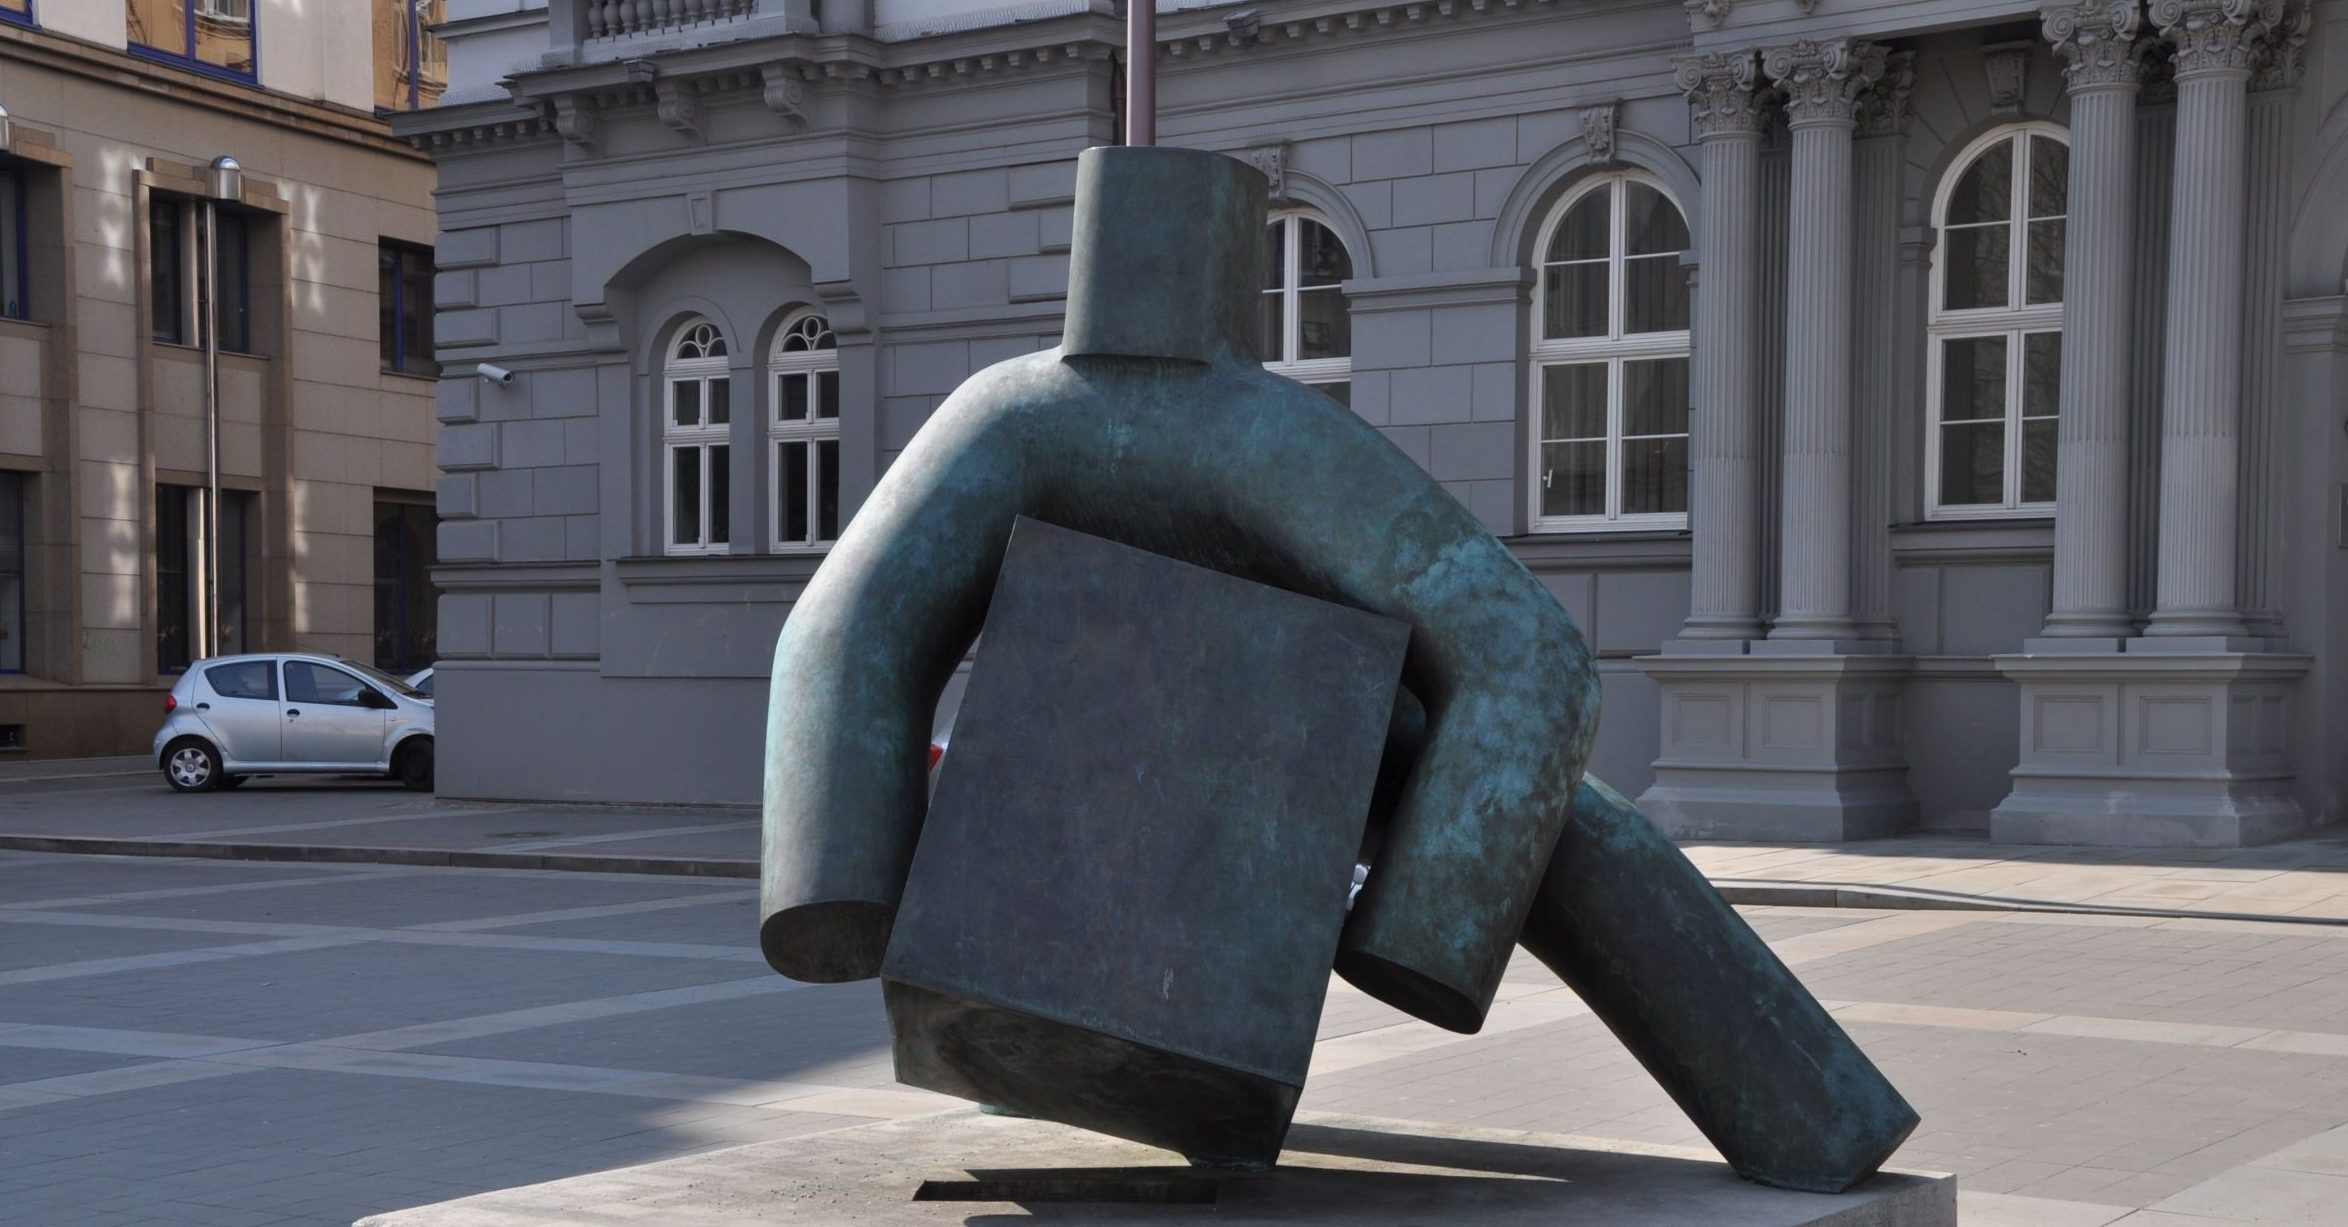 The statue of Justice by Marius Kotrba in Brno, Czech republic